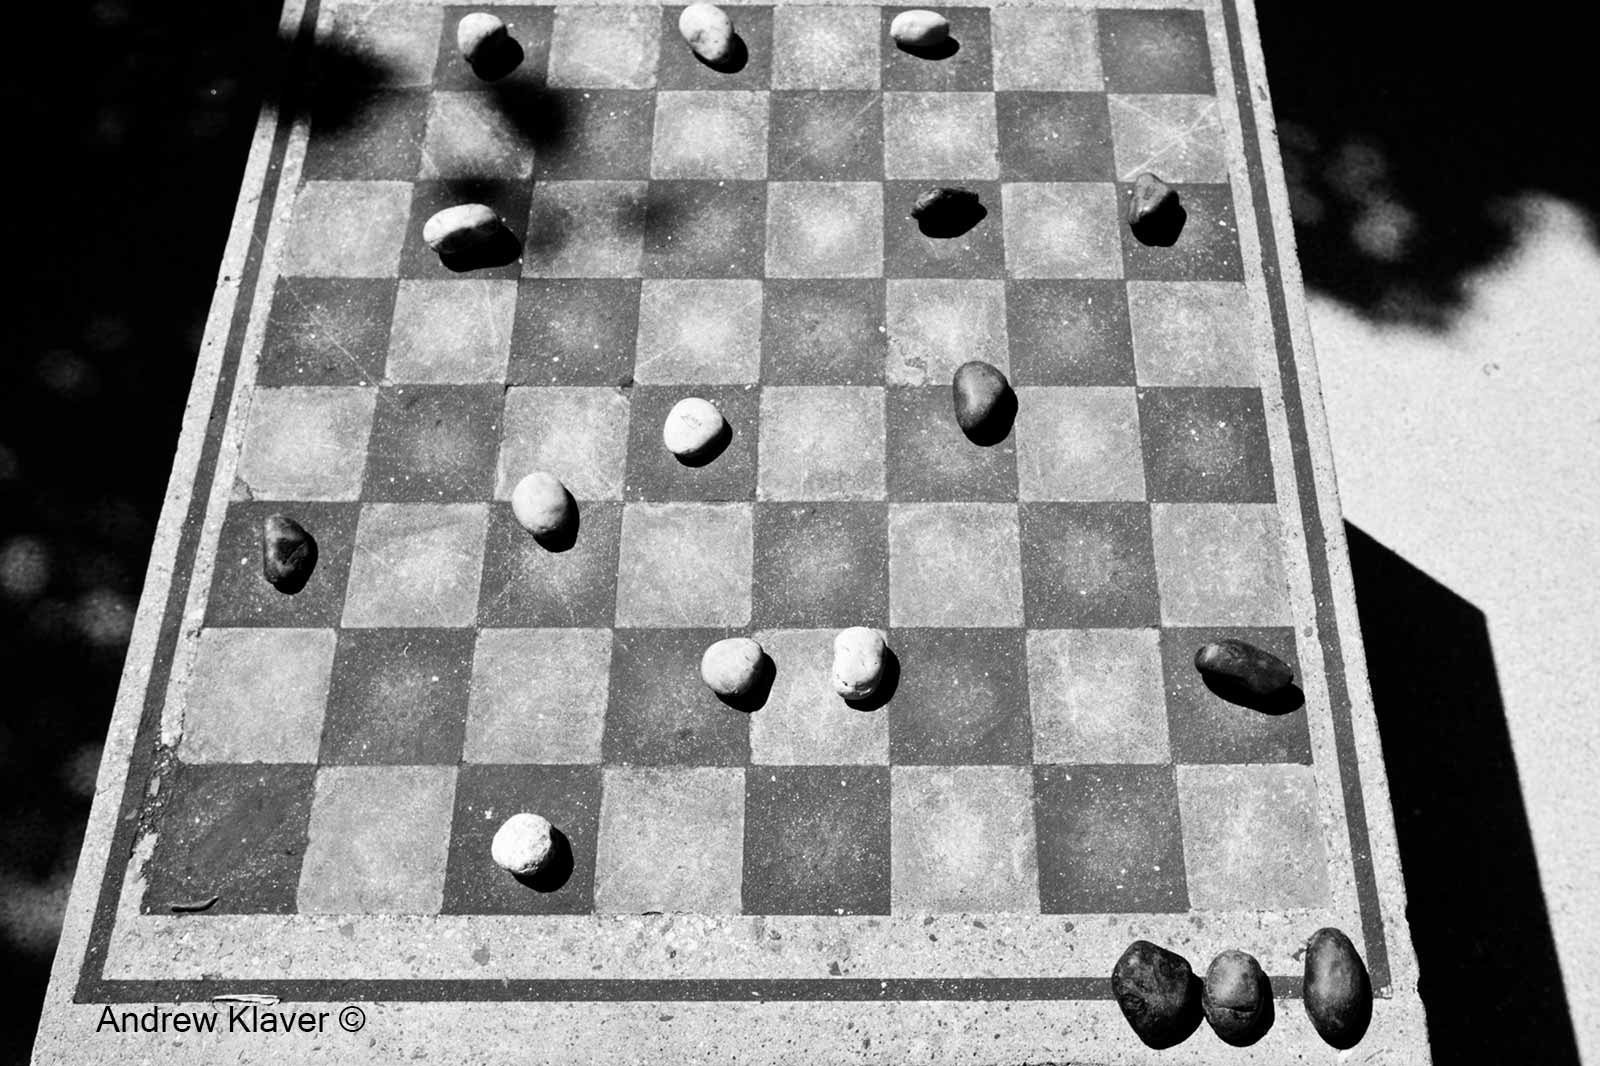 Checkers, 2009